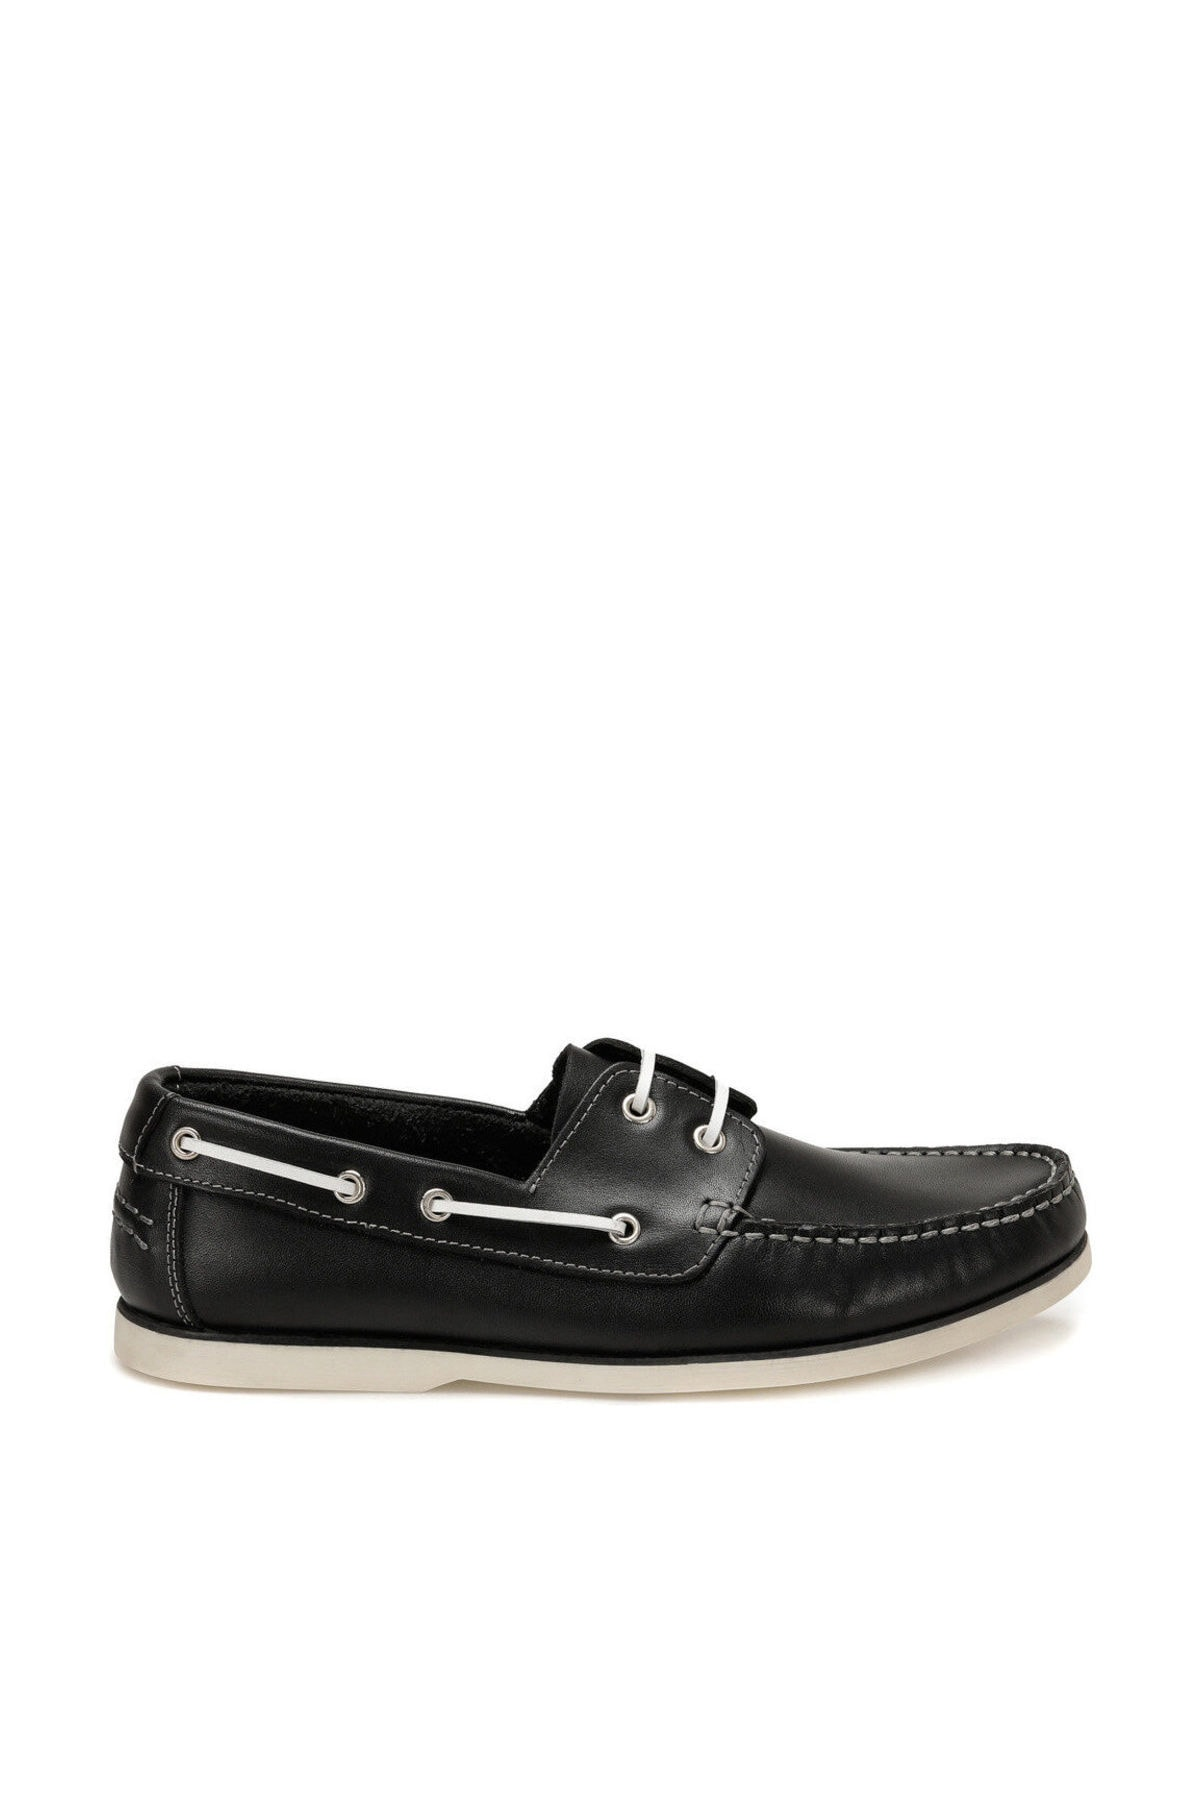 OXIDE MRB81 Siyah Erkek Ayakkabı 100518297 2